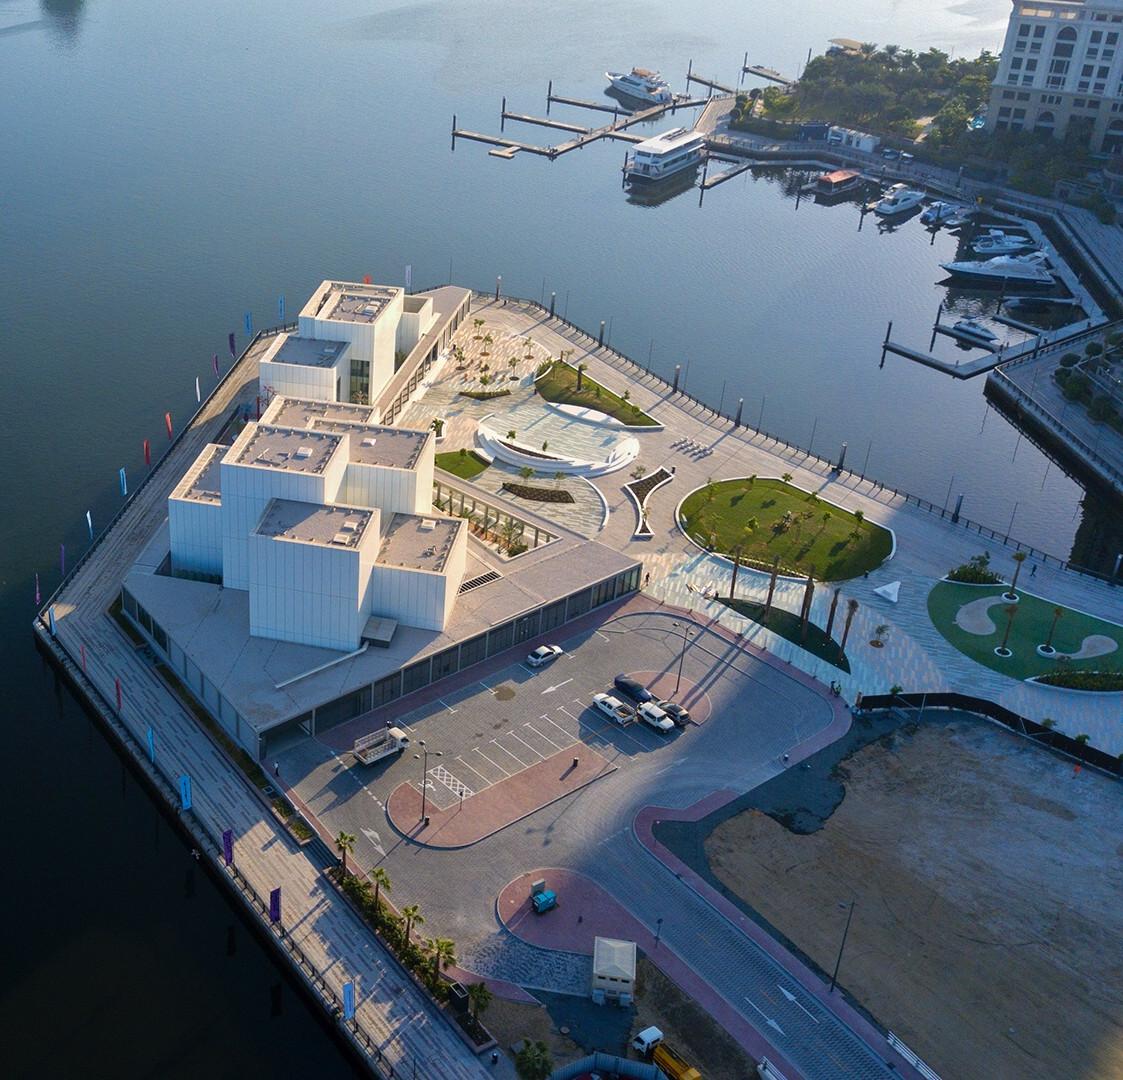 Jameel Art Centre; designed by Serie + Waiwai Design